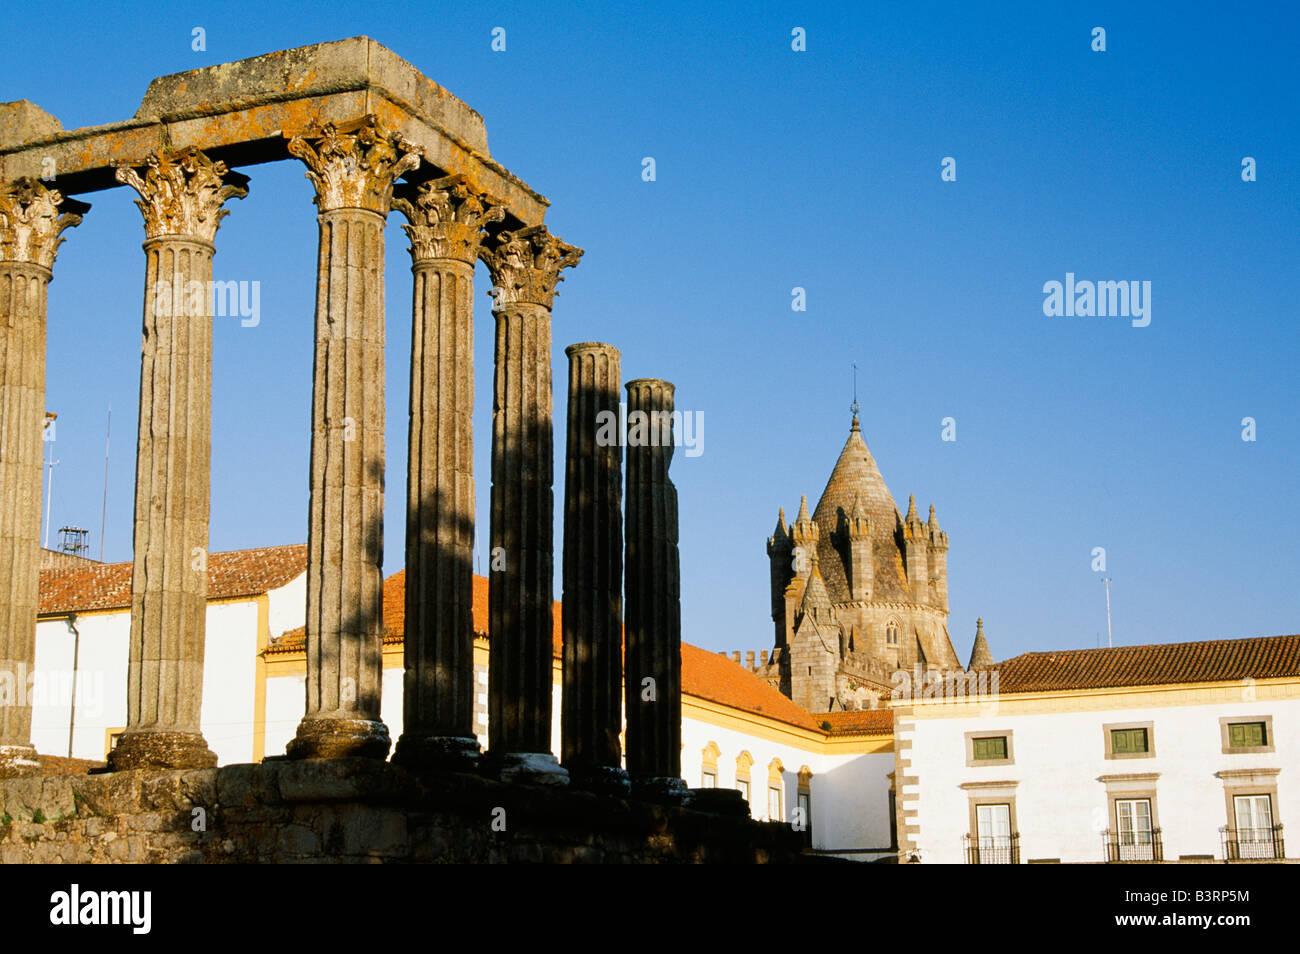 Corinthian columns of an ancient Roman Temple, Evora, Portugal - Stock Image